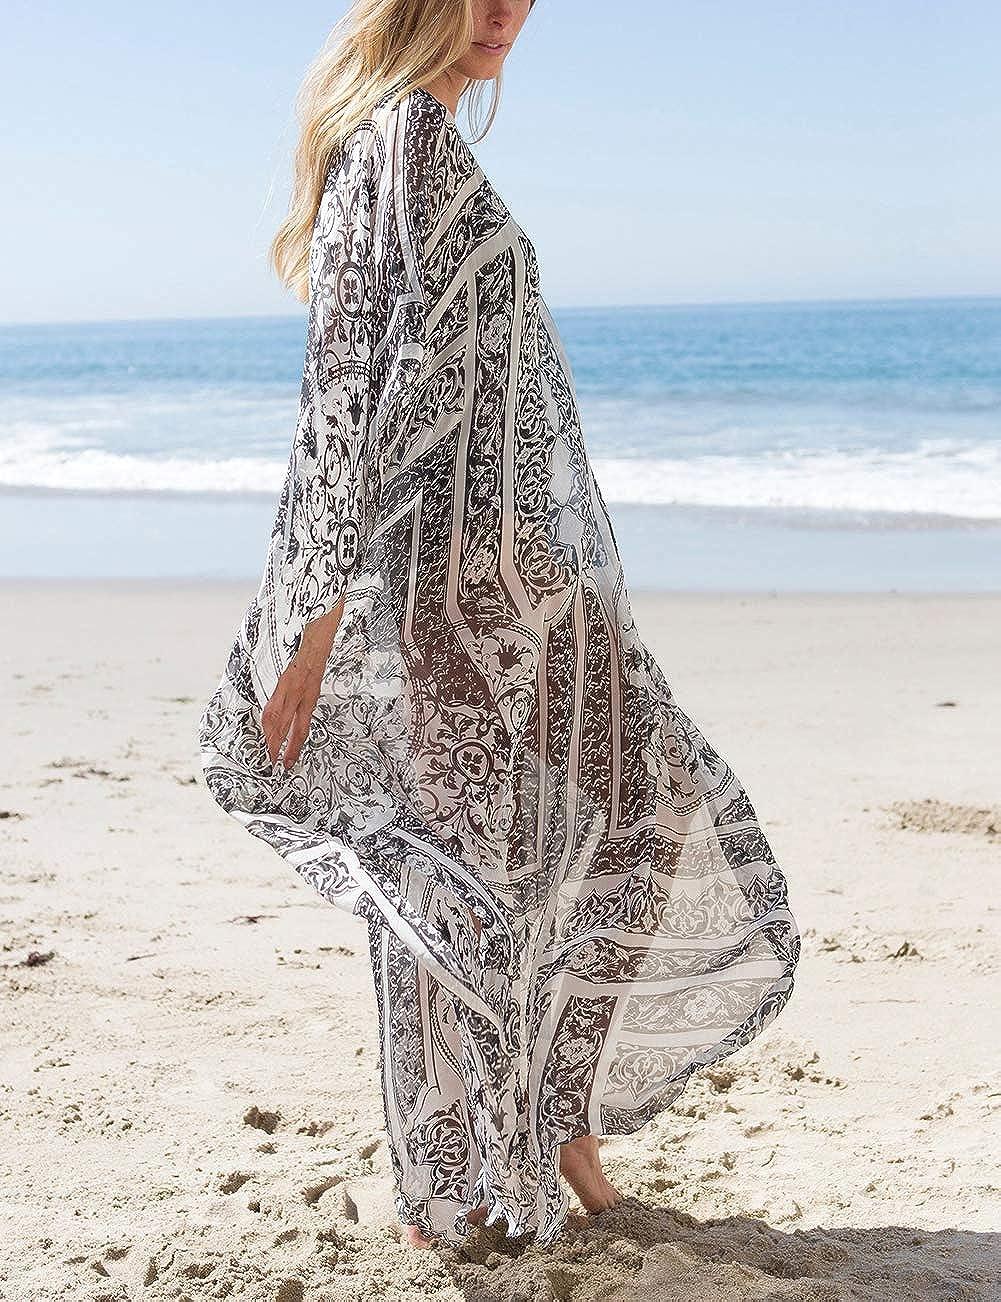 Bsubseach Women Bathing Suits Cover Up Ethnic Print Kaftan Beach Maxi Dress